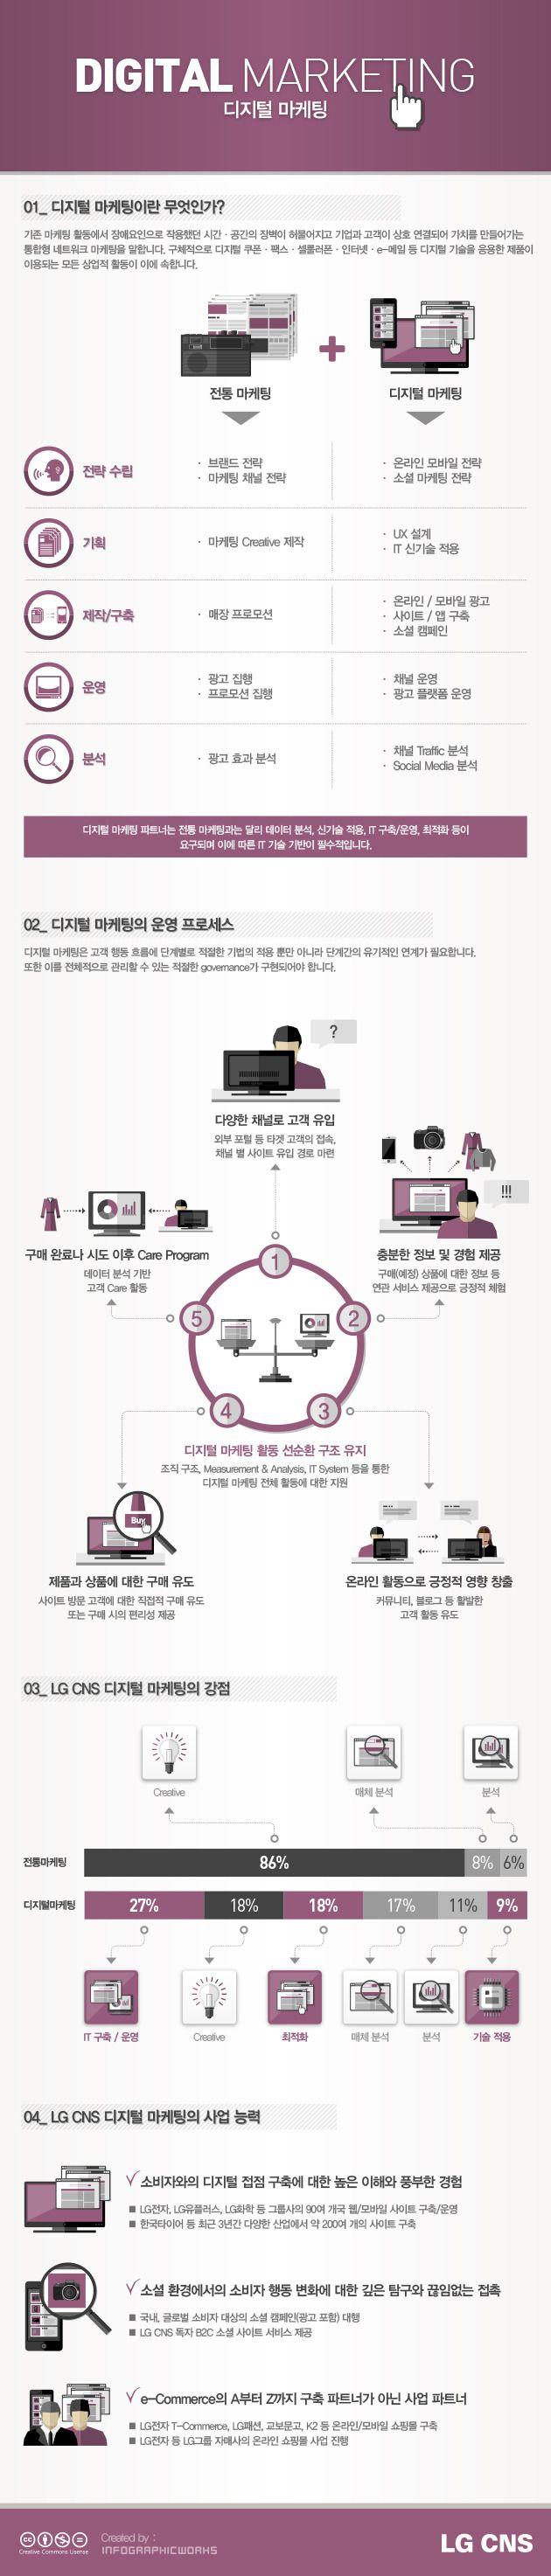 [Infographics] DIGITAL MARKETING